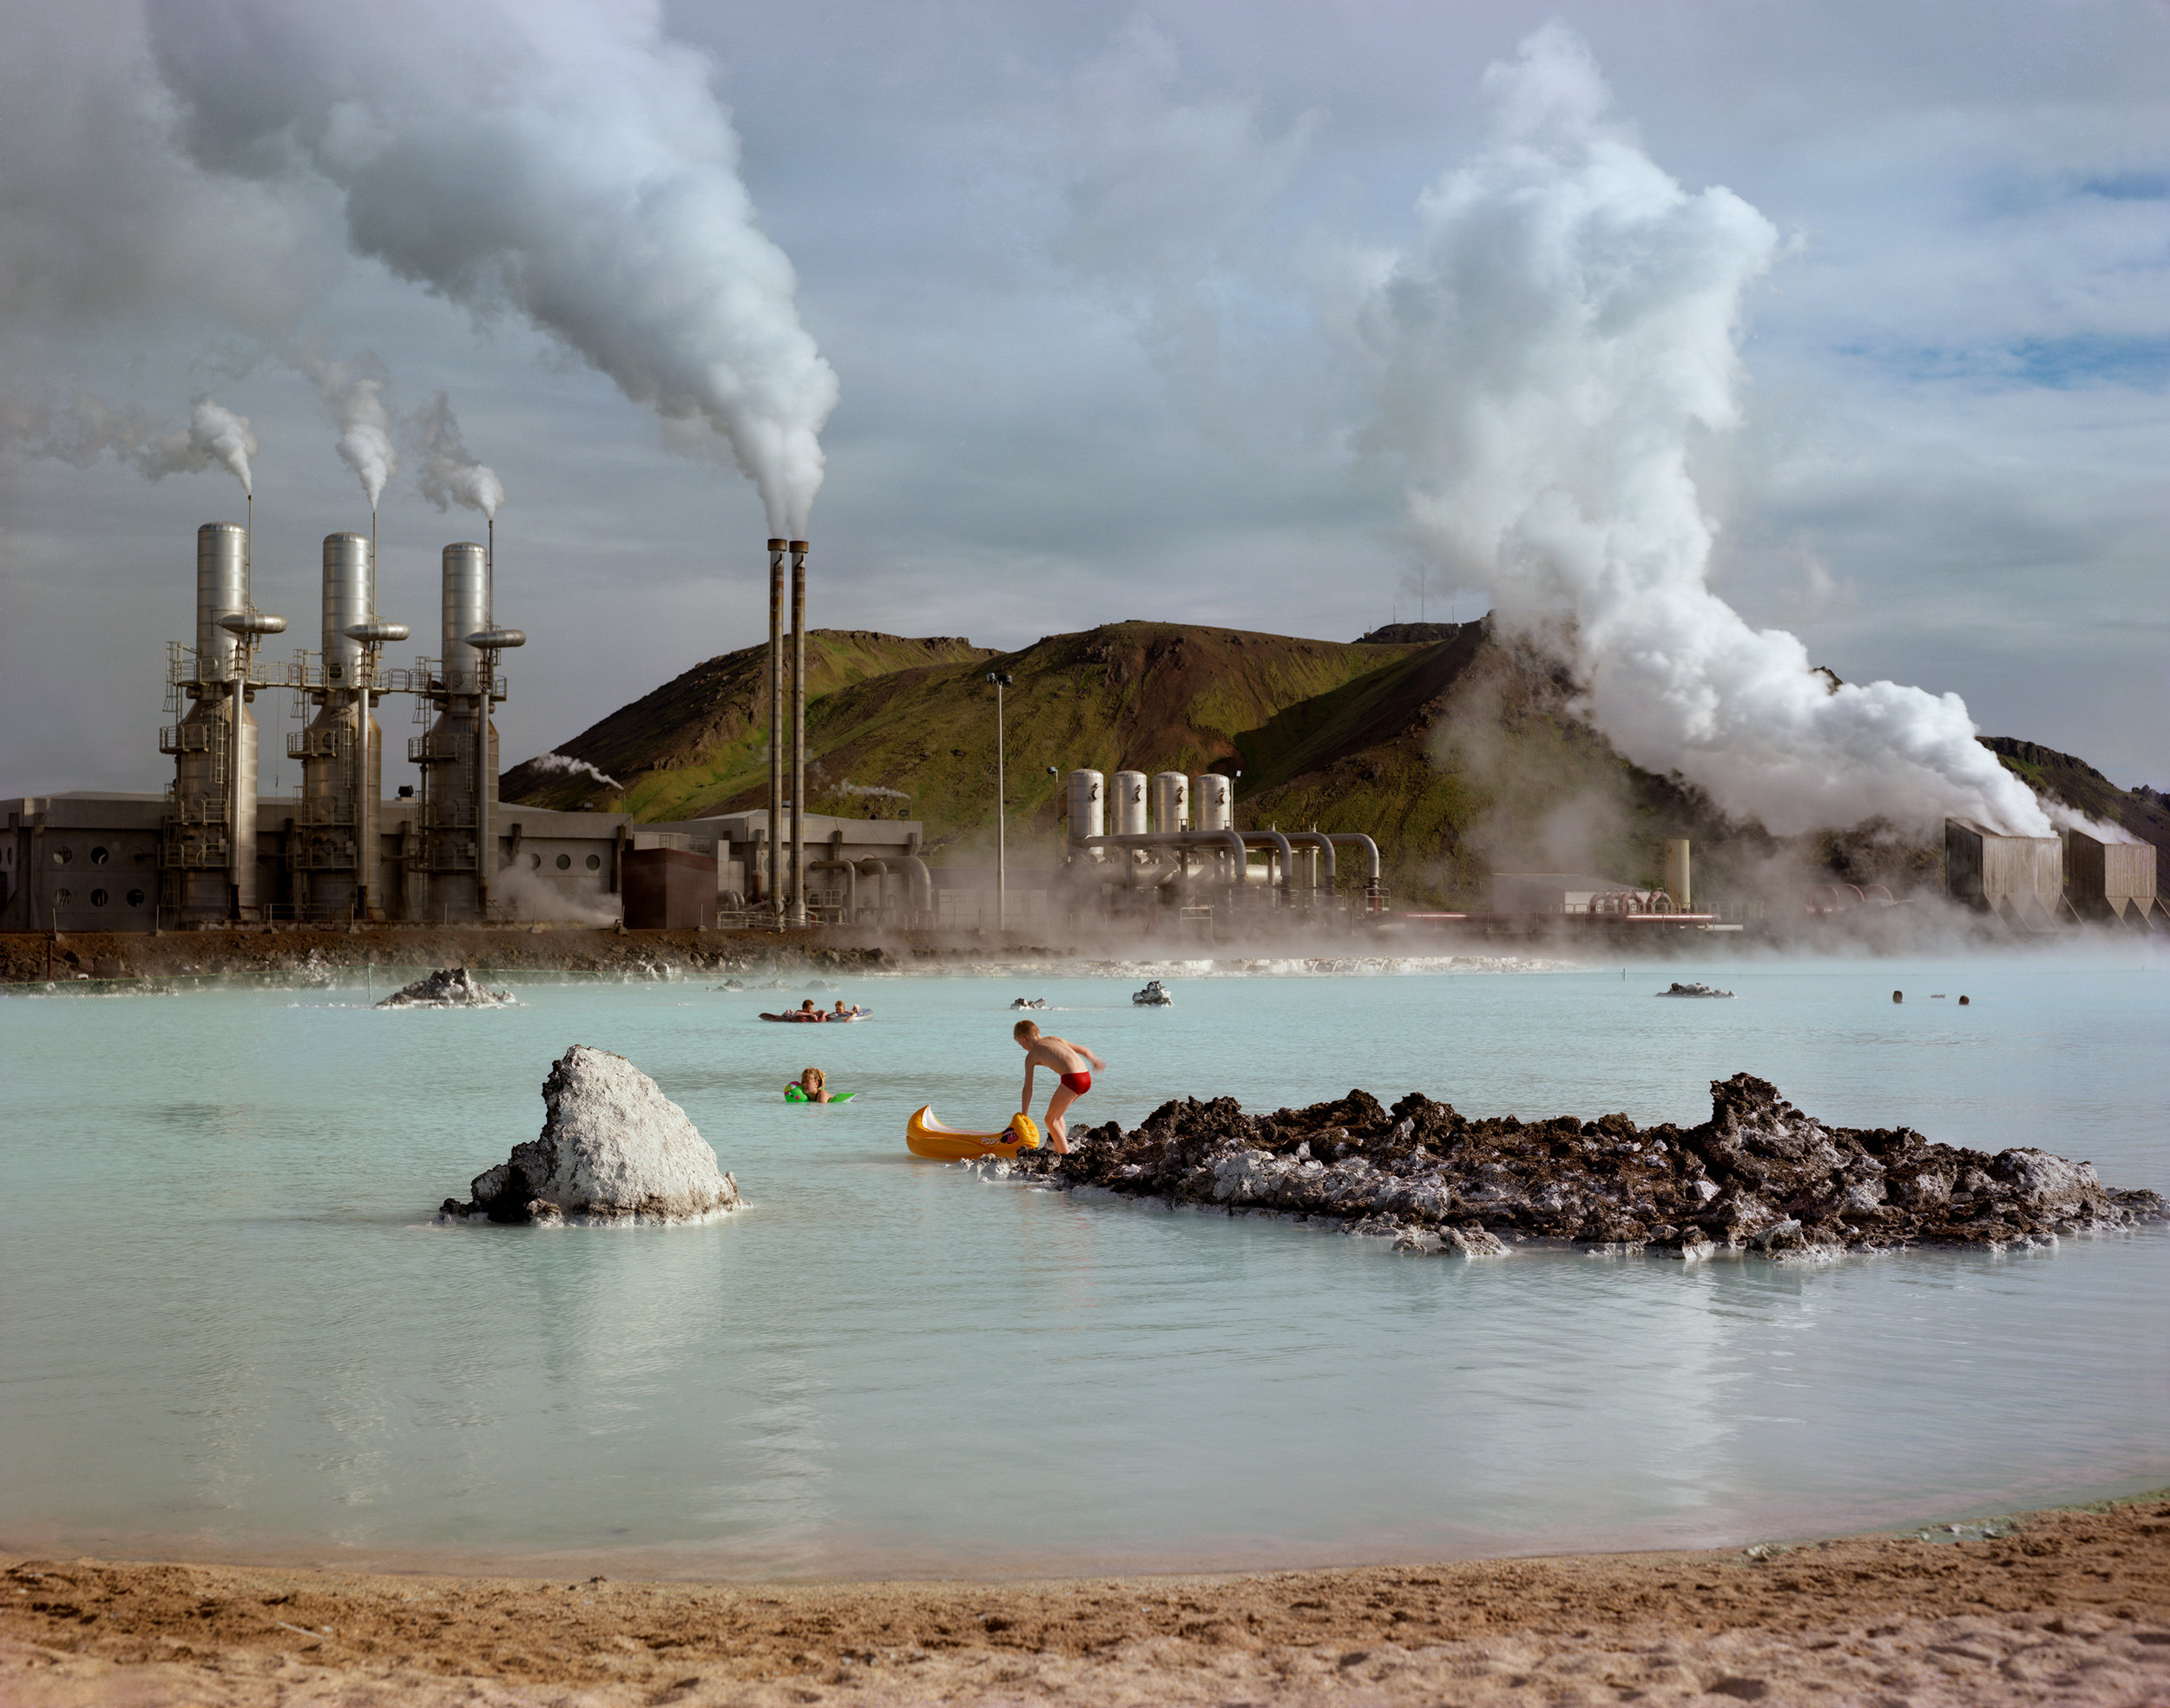 Geothermal electricity generating plant, Krafla, Iceland, 1987